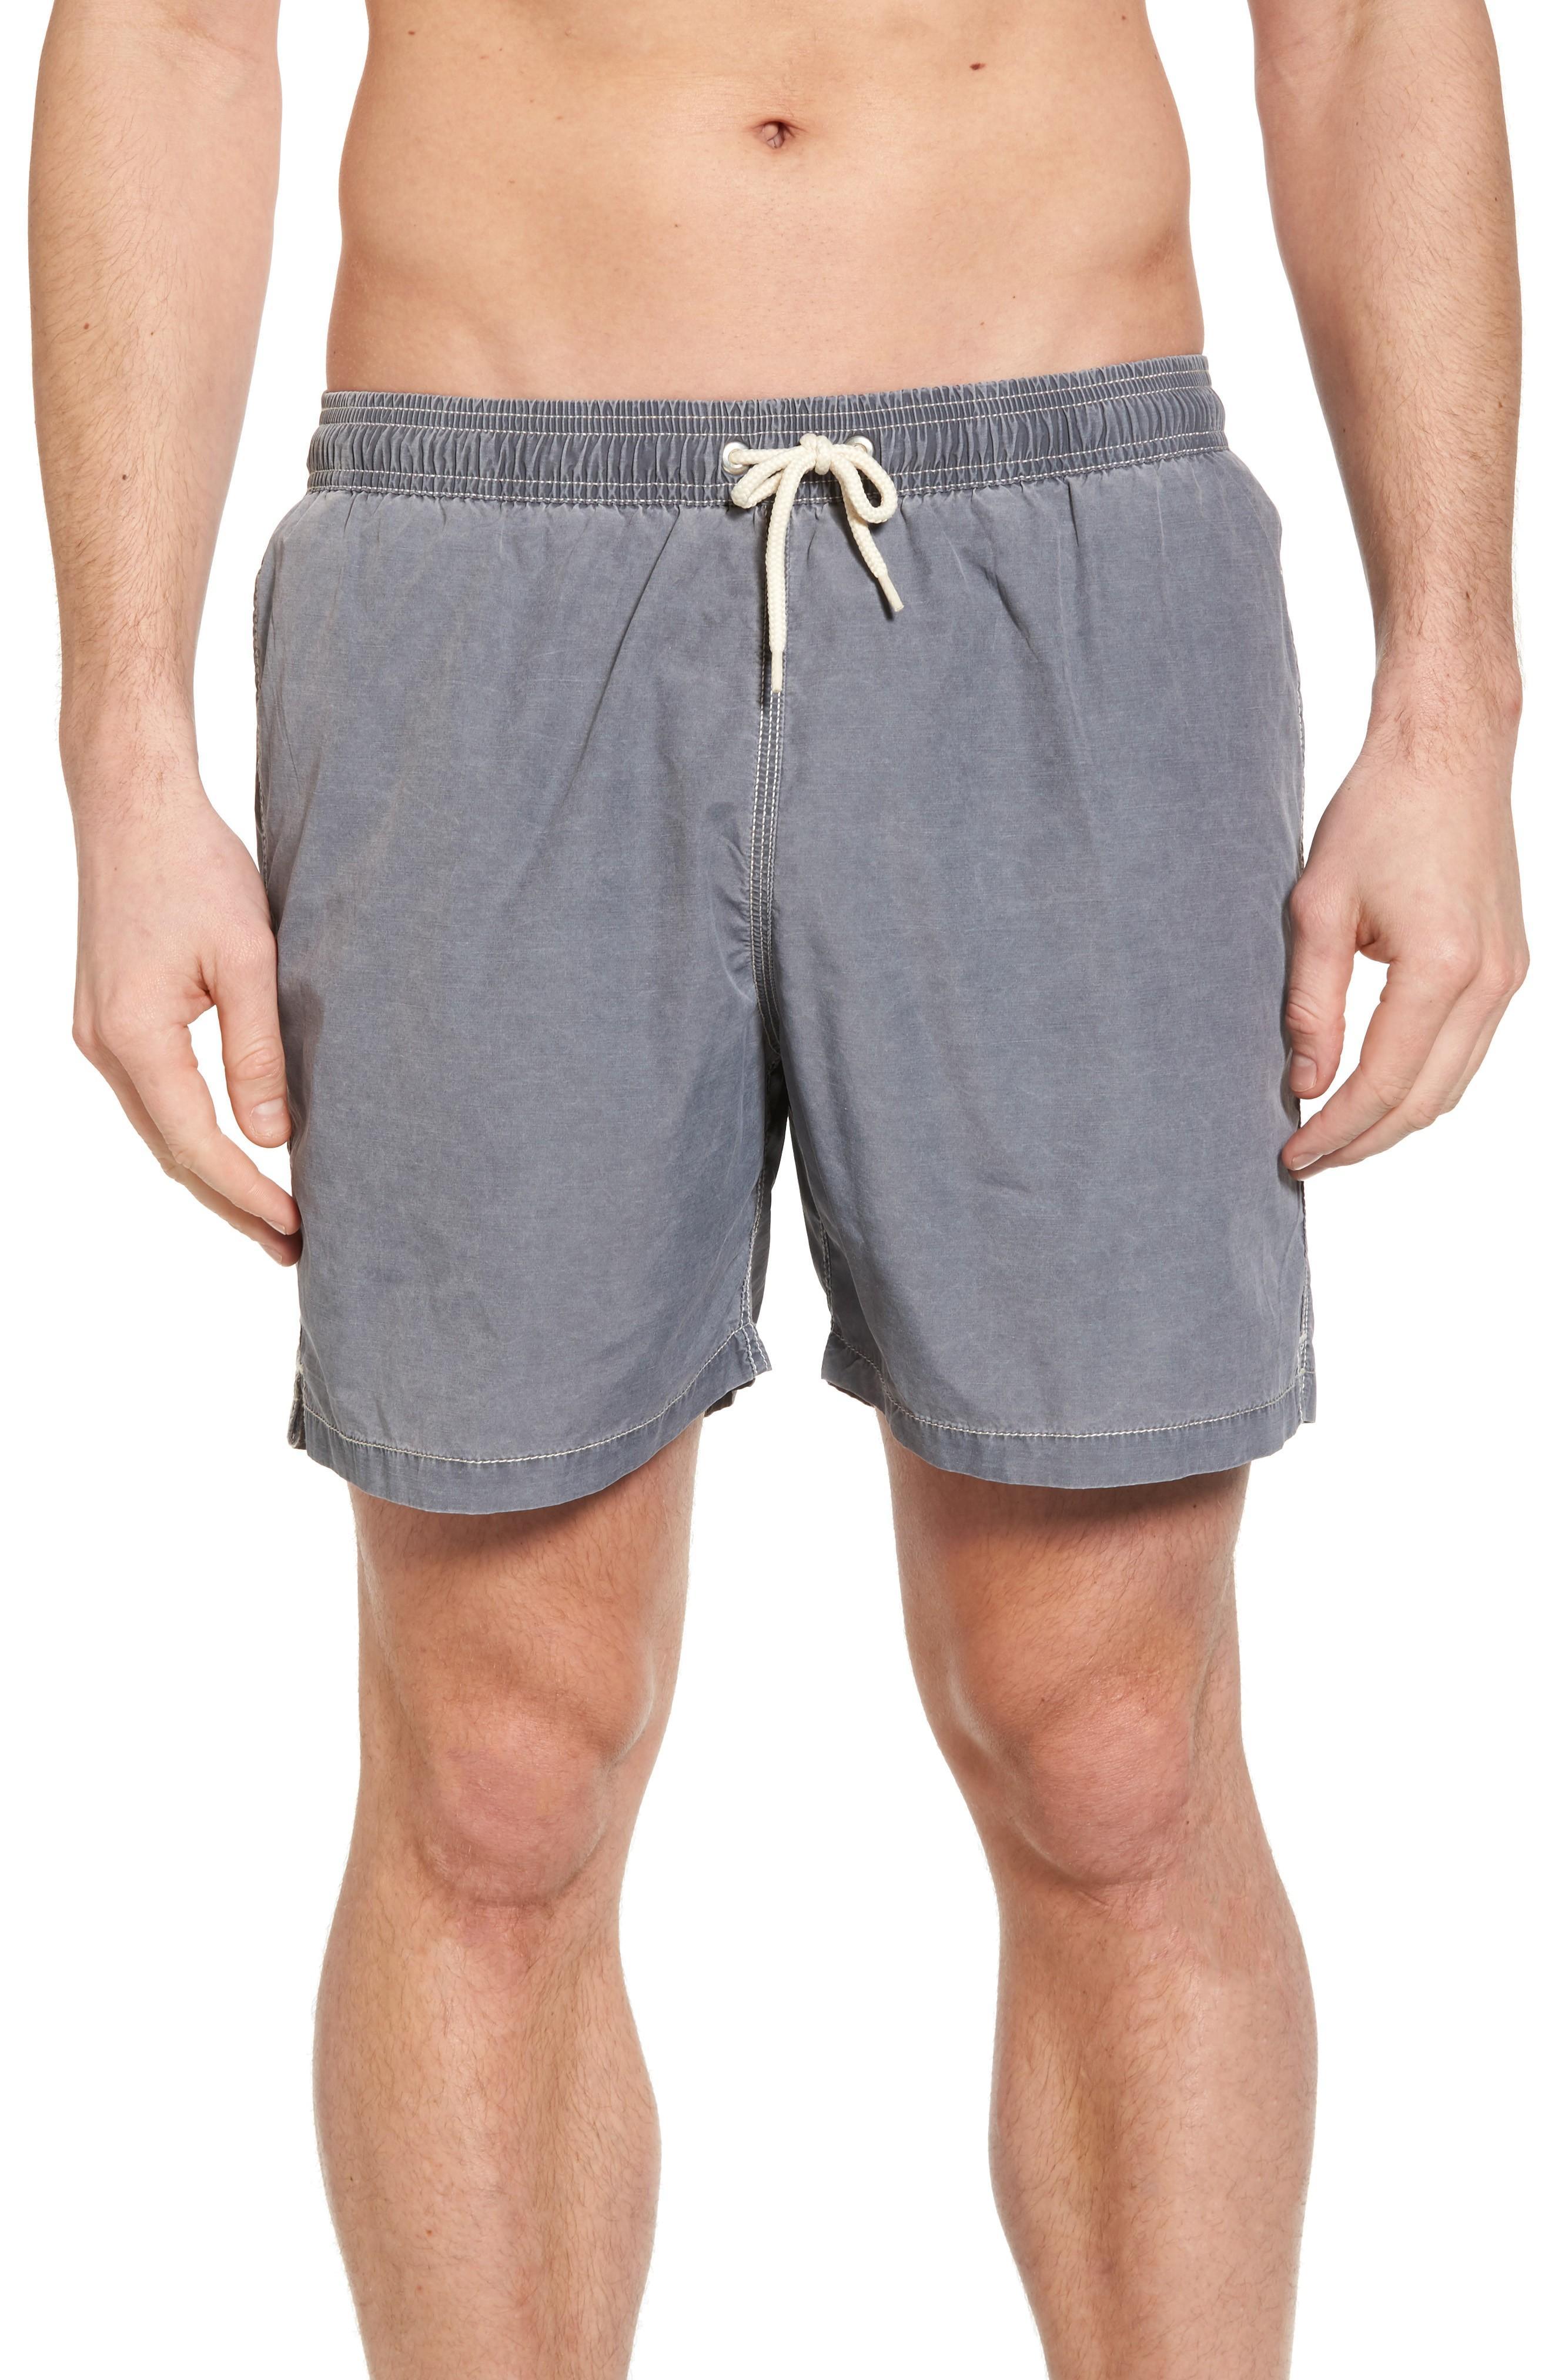 fb5deaedb9fa9 Barbour Victor Swim Trunks In Slate Grey | ModeSens